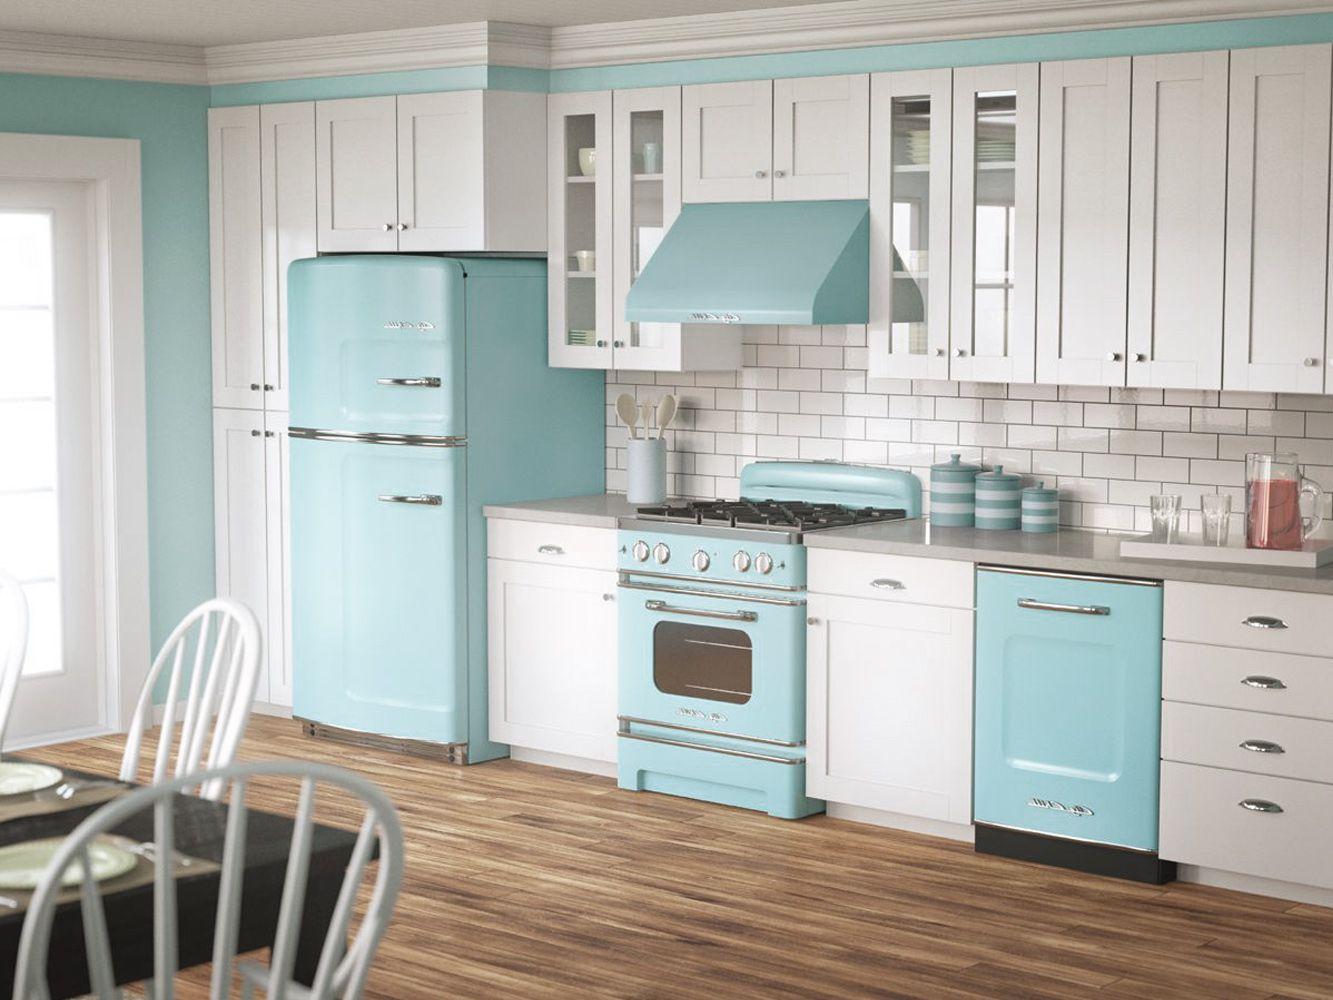 1950s Home Decor Pastel Colors Kitchen Interior Ideas